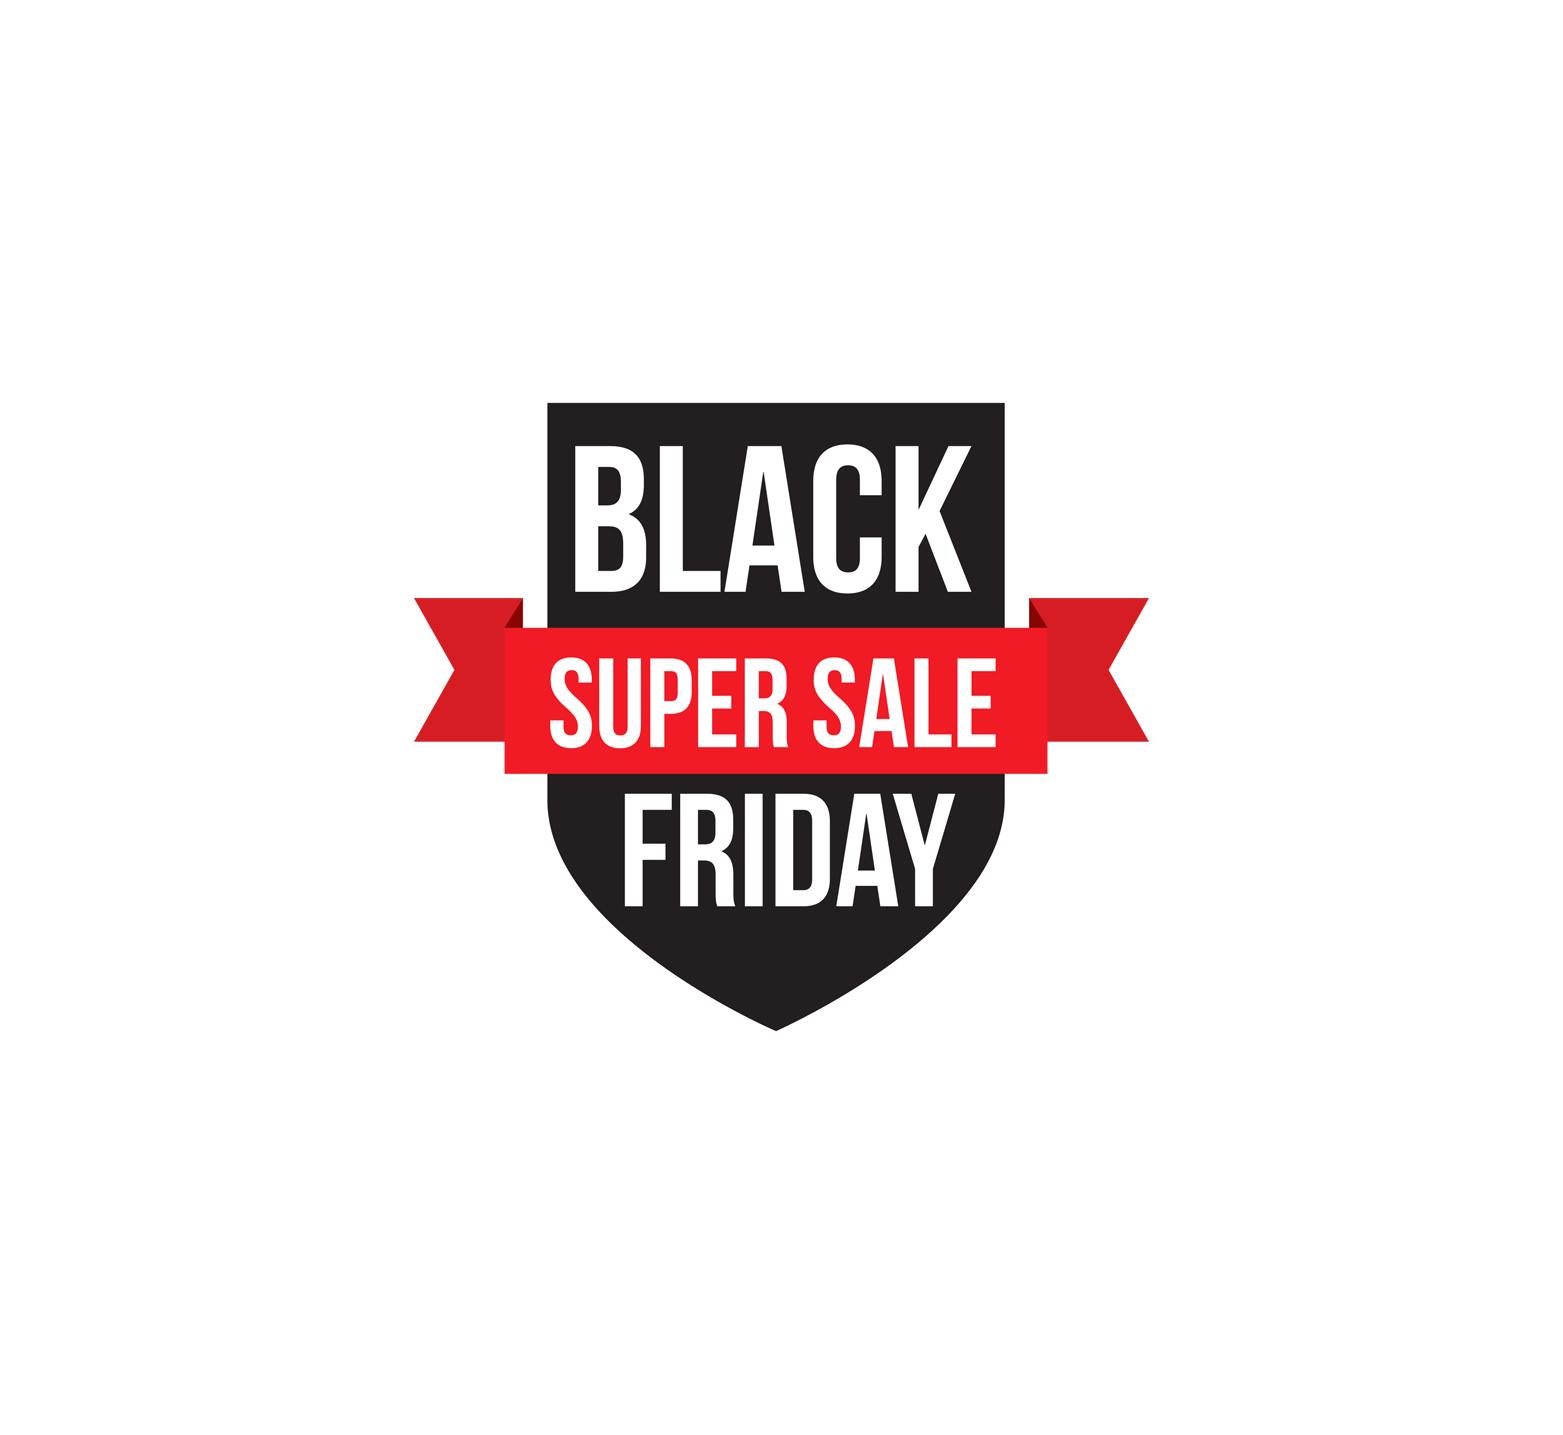 Black Friday Super Sale.jpg